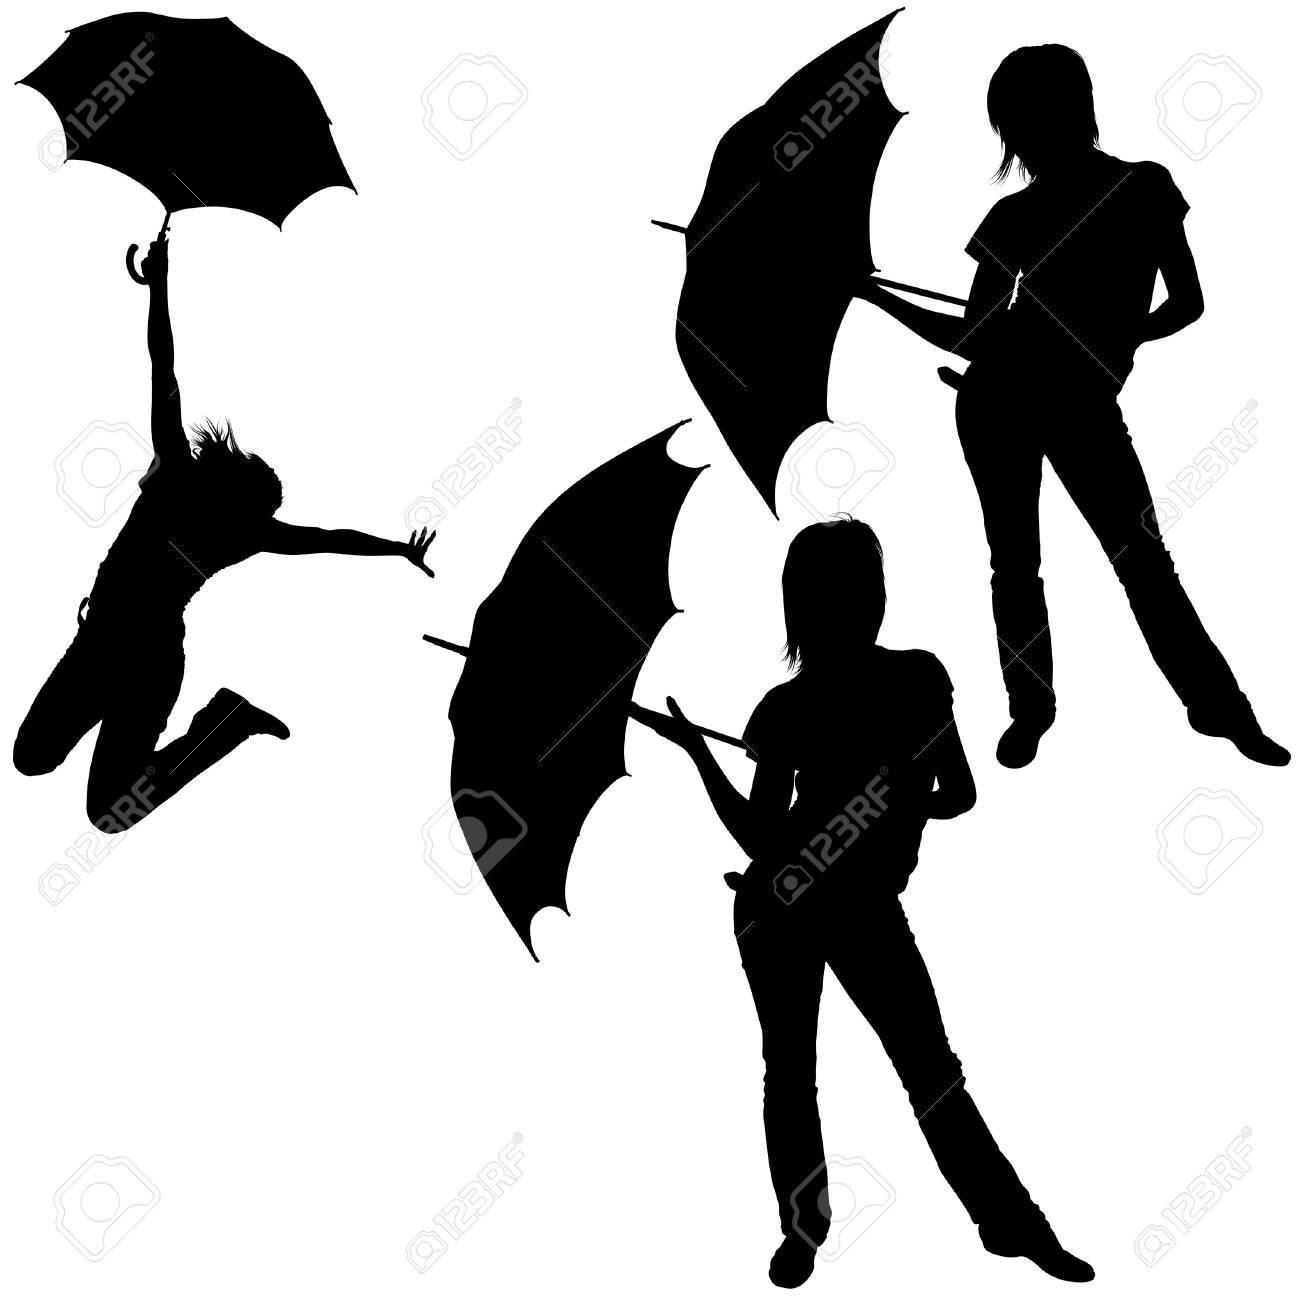 Girl And Umbrella 06 - detailed sillhouettes as vector Stock Vector - 4812643